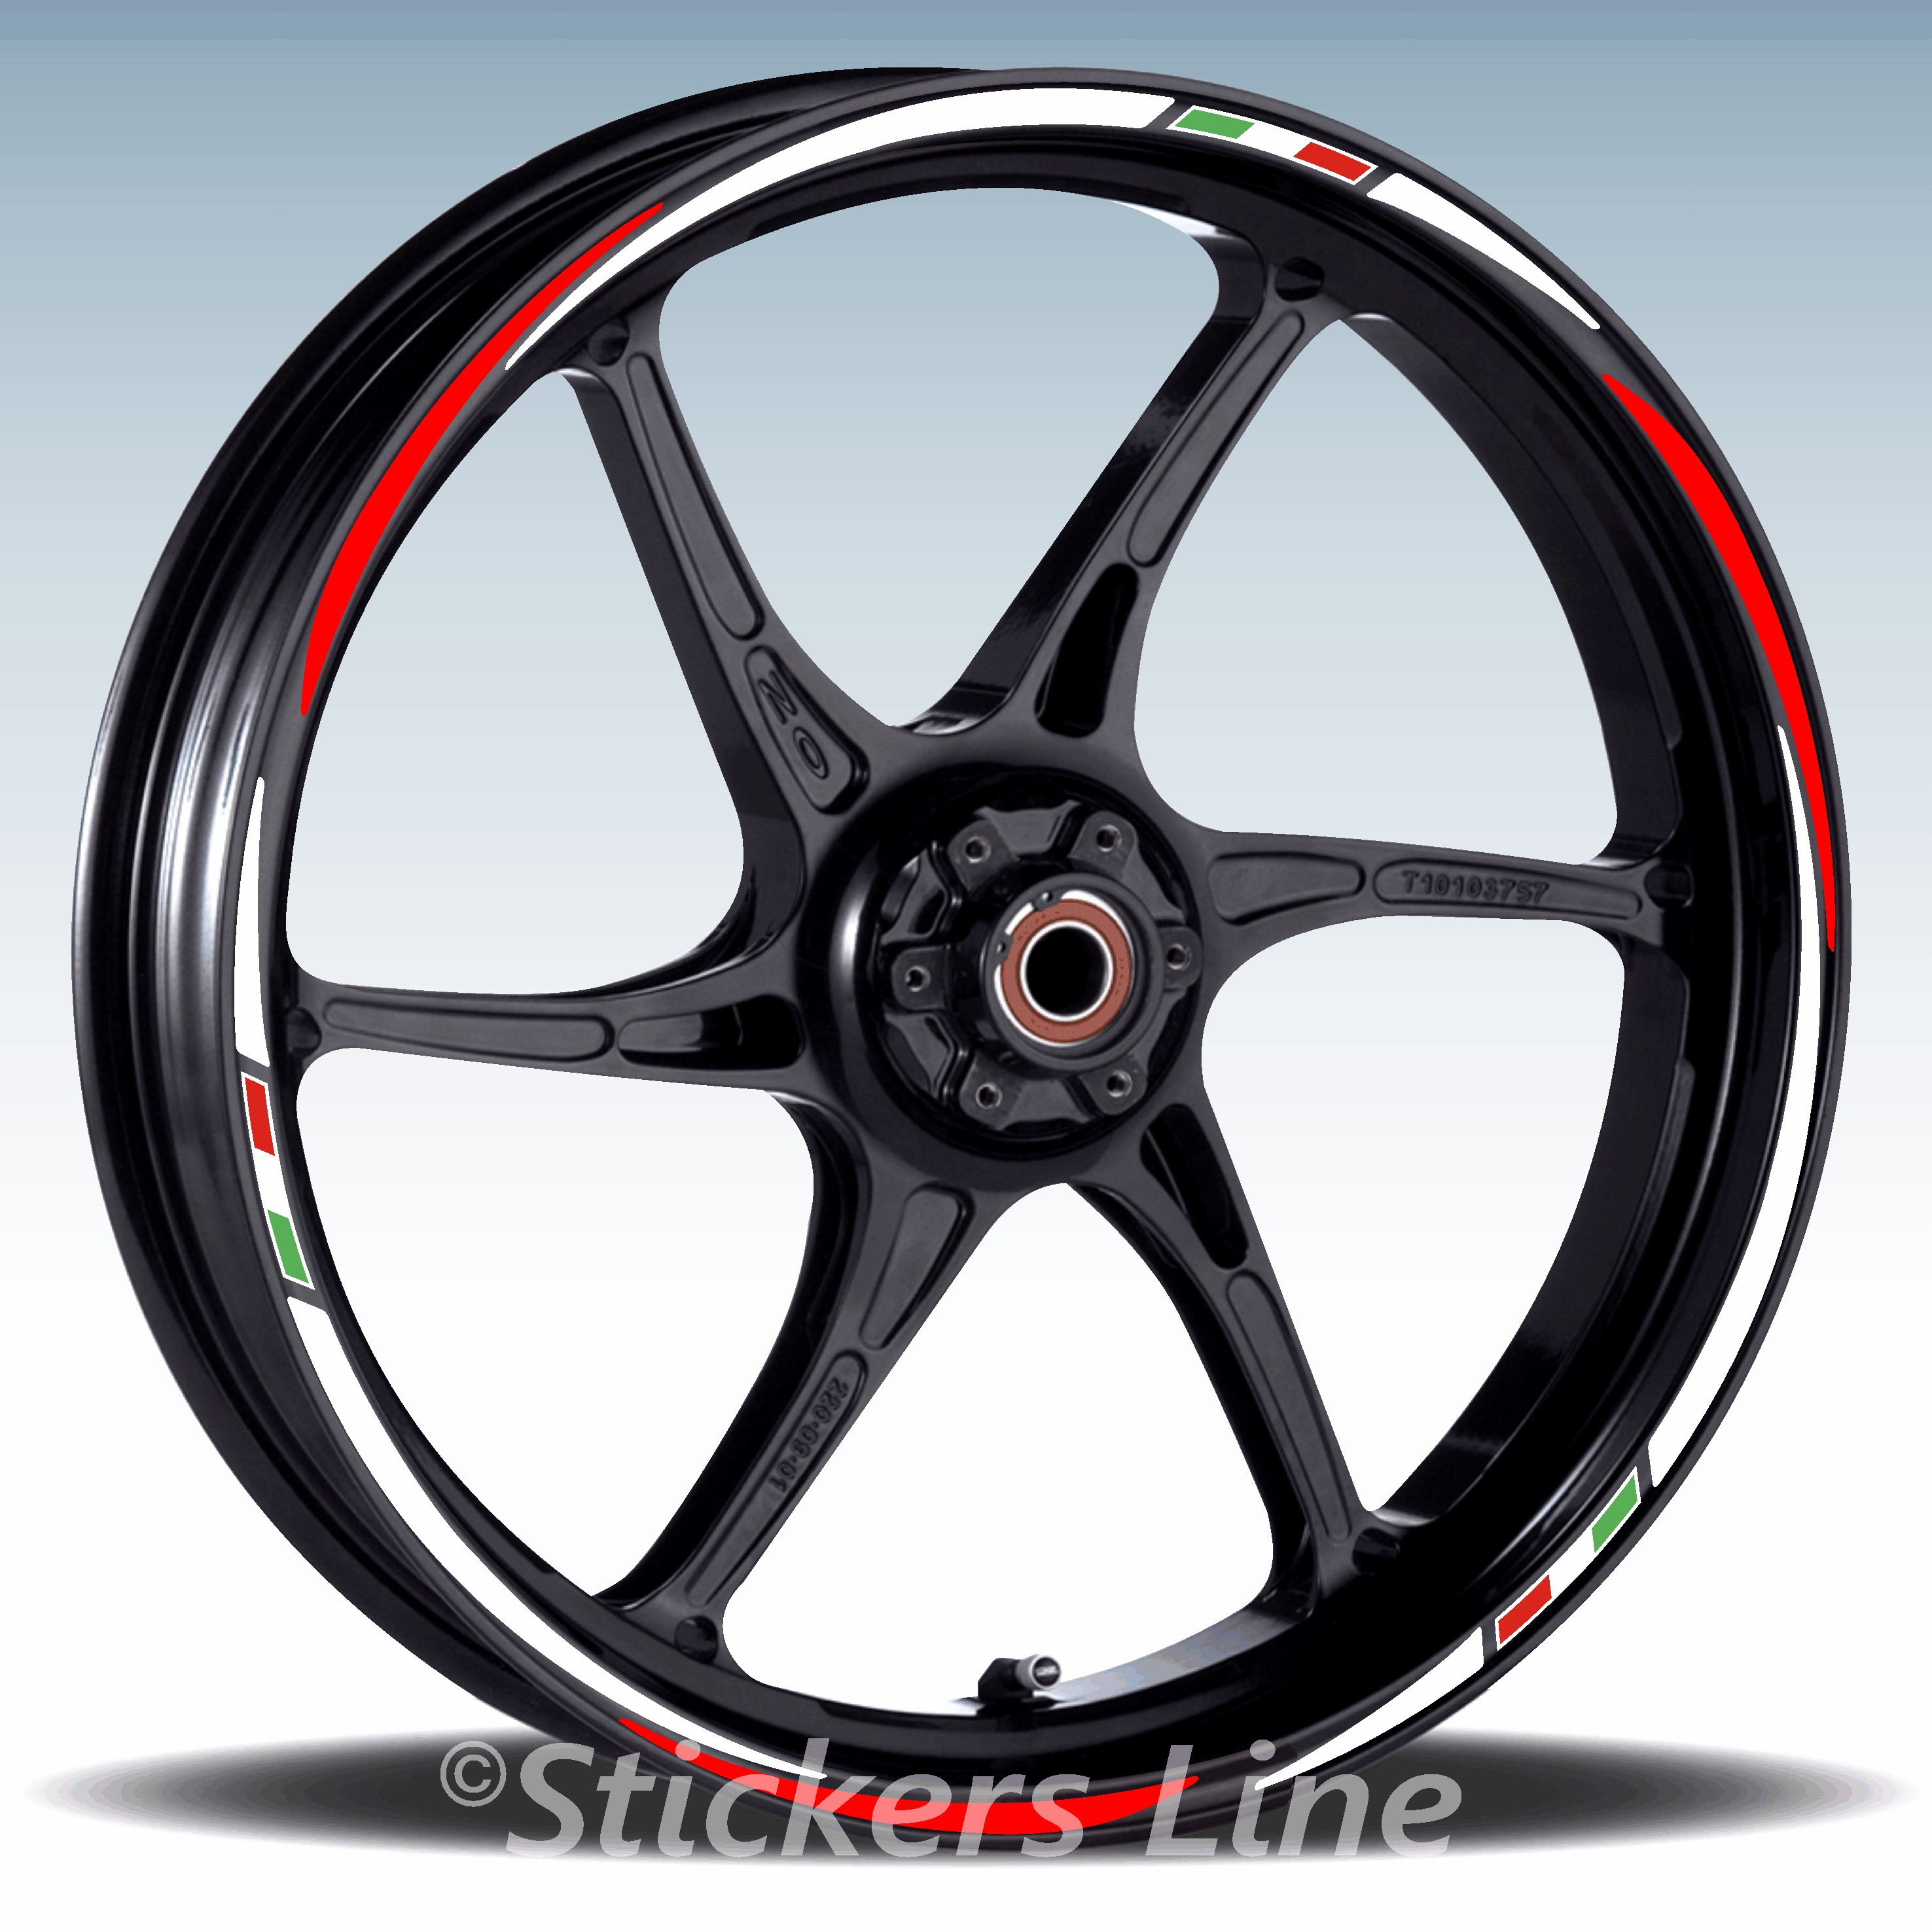 Adesivi Cerchi Kit ruote modello racing YAMAHA FZ8